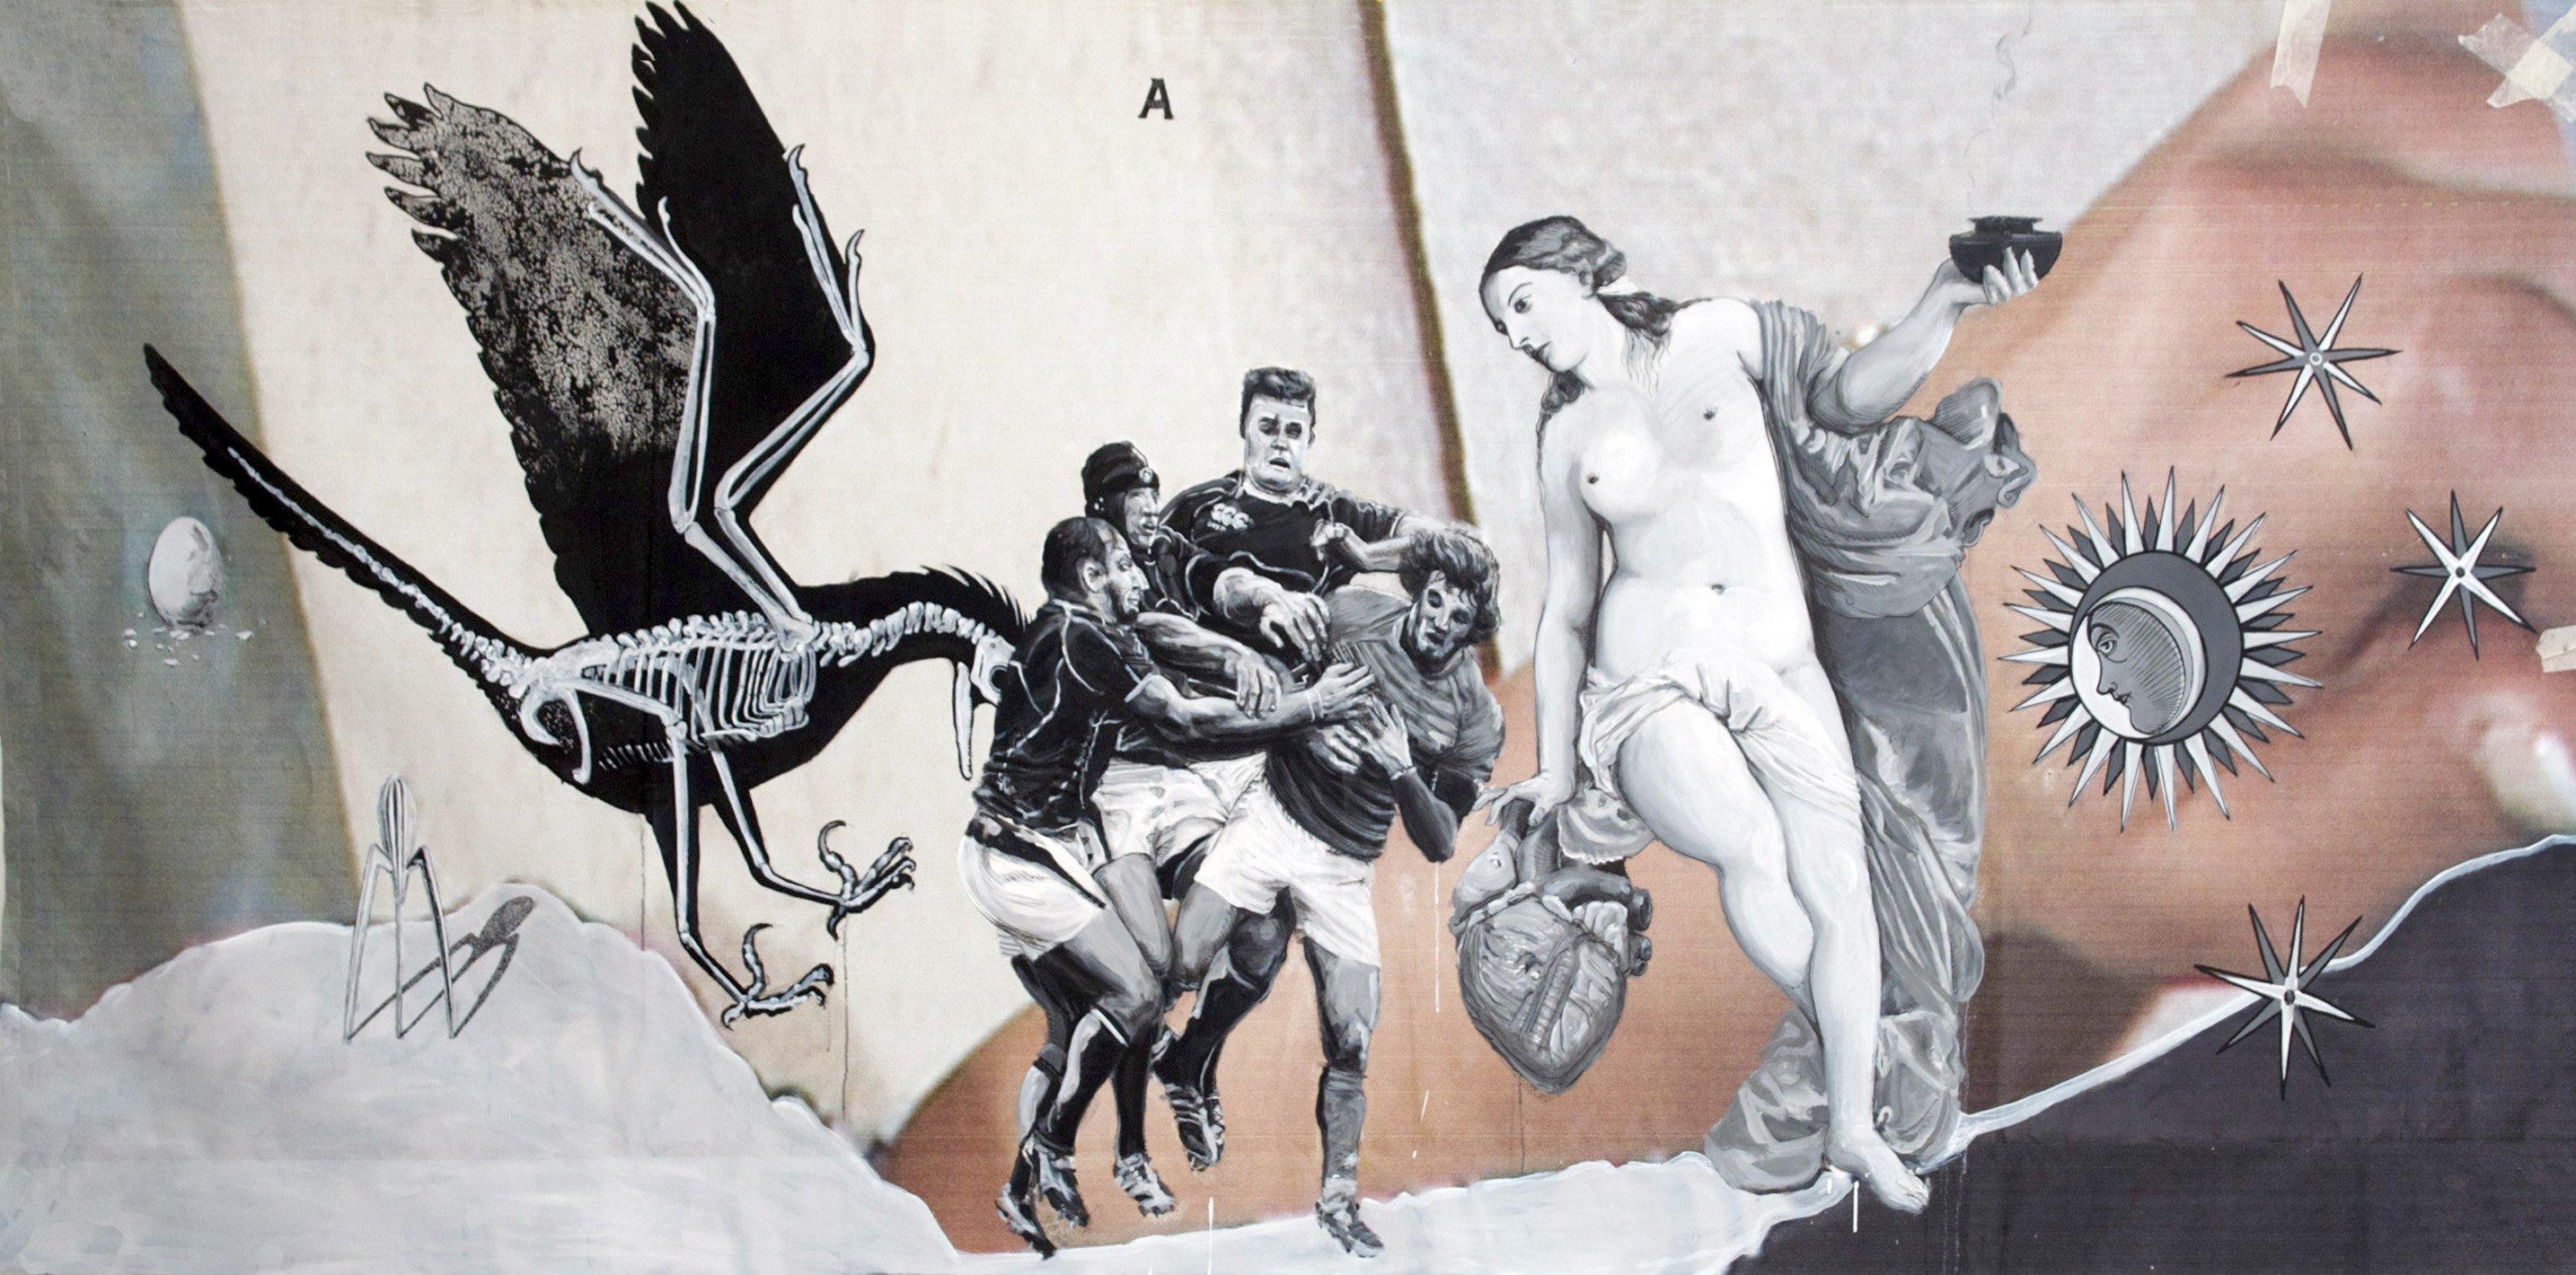 untitled 135 x 300 cm 2012